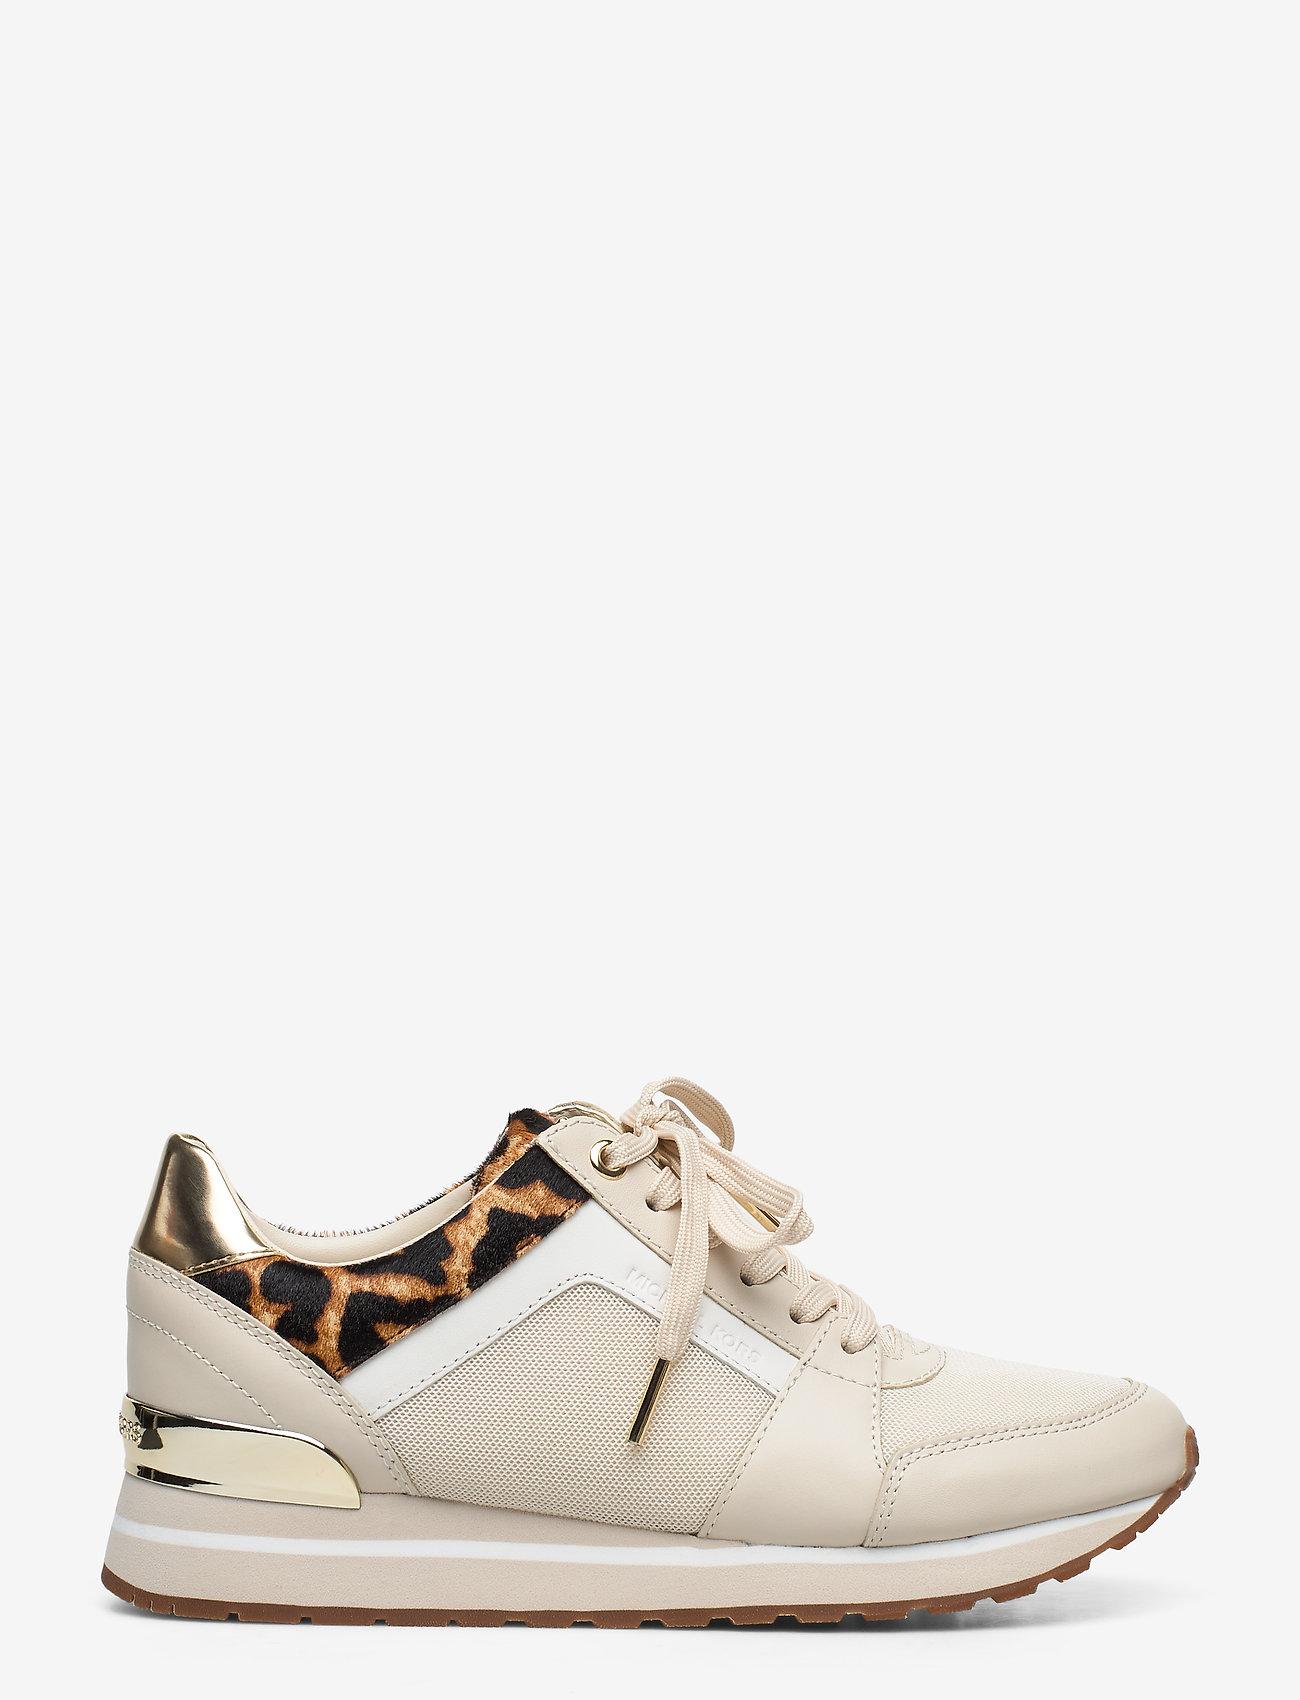 Michael Kors Shoes - BILLIE TRAINER - low top sneakers - ecru